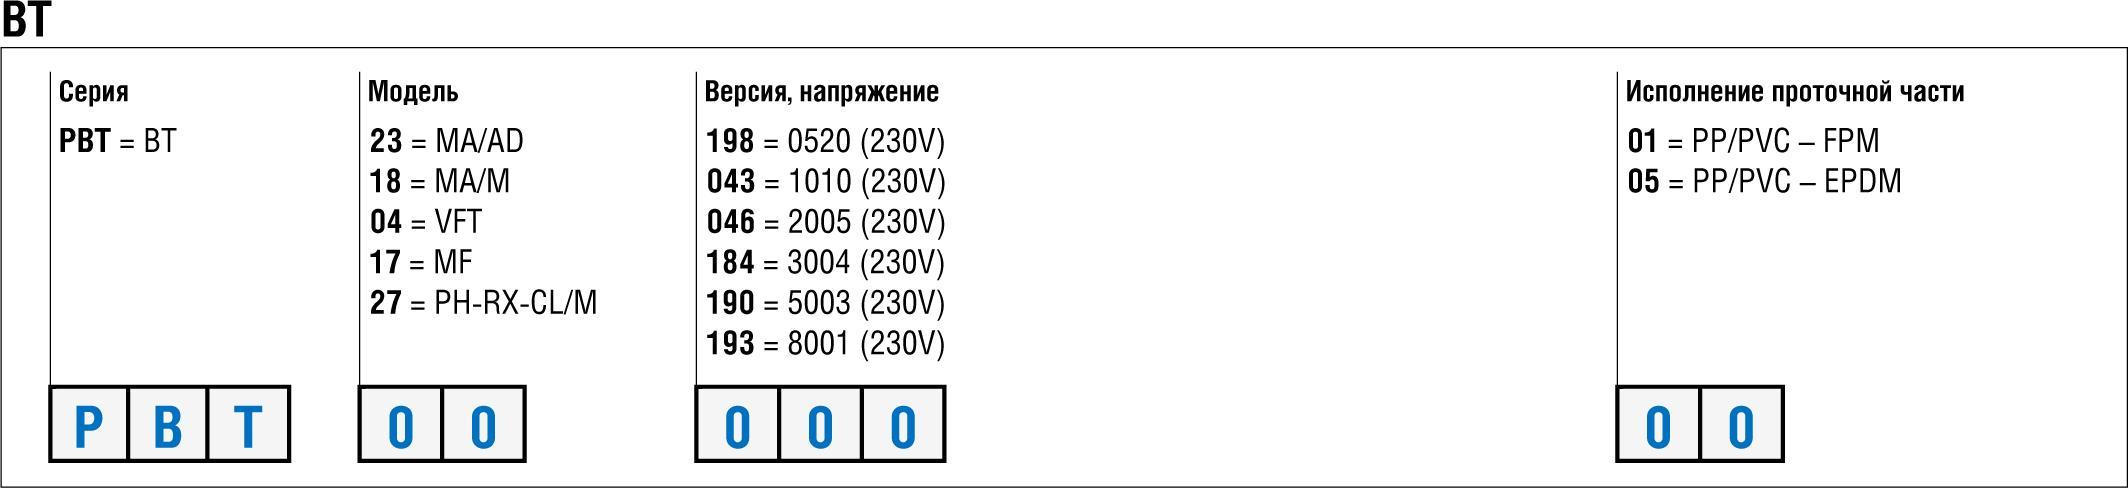 РАСШИФРОВКА КОДА BT